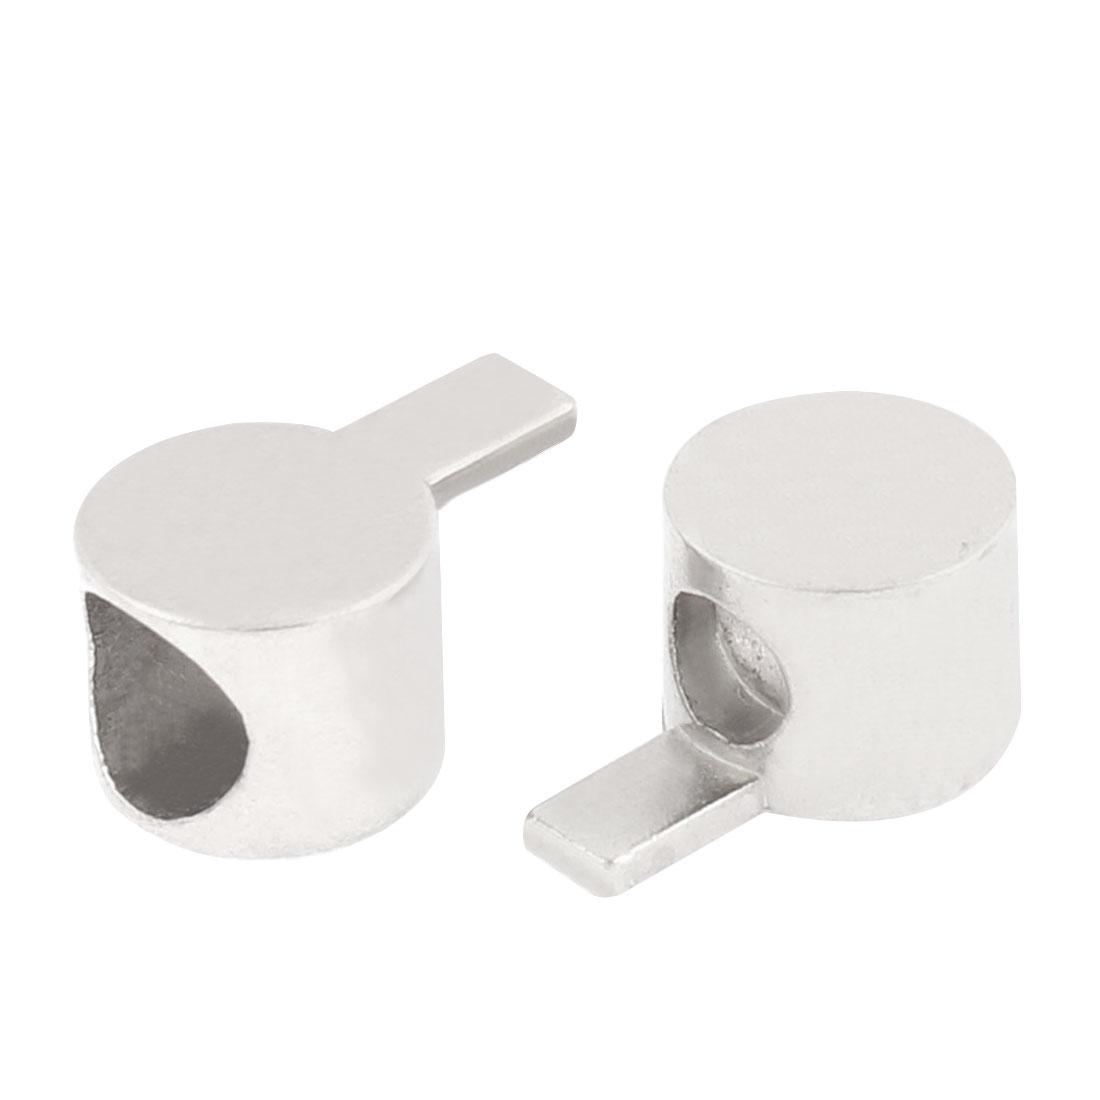 2pcs T Slot T-Slot Anchor Butt Fastener Cam Hardware Tool